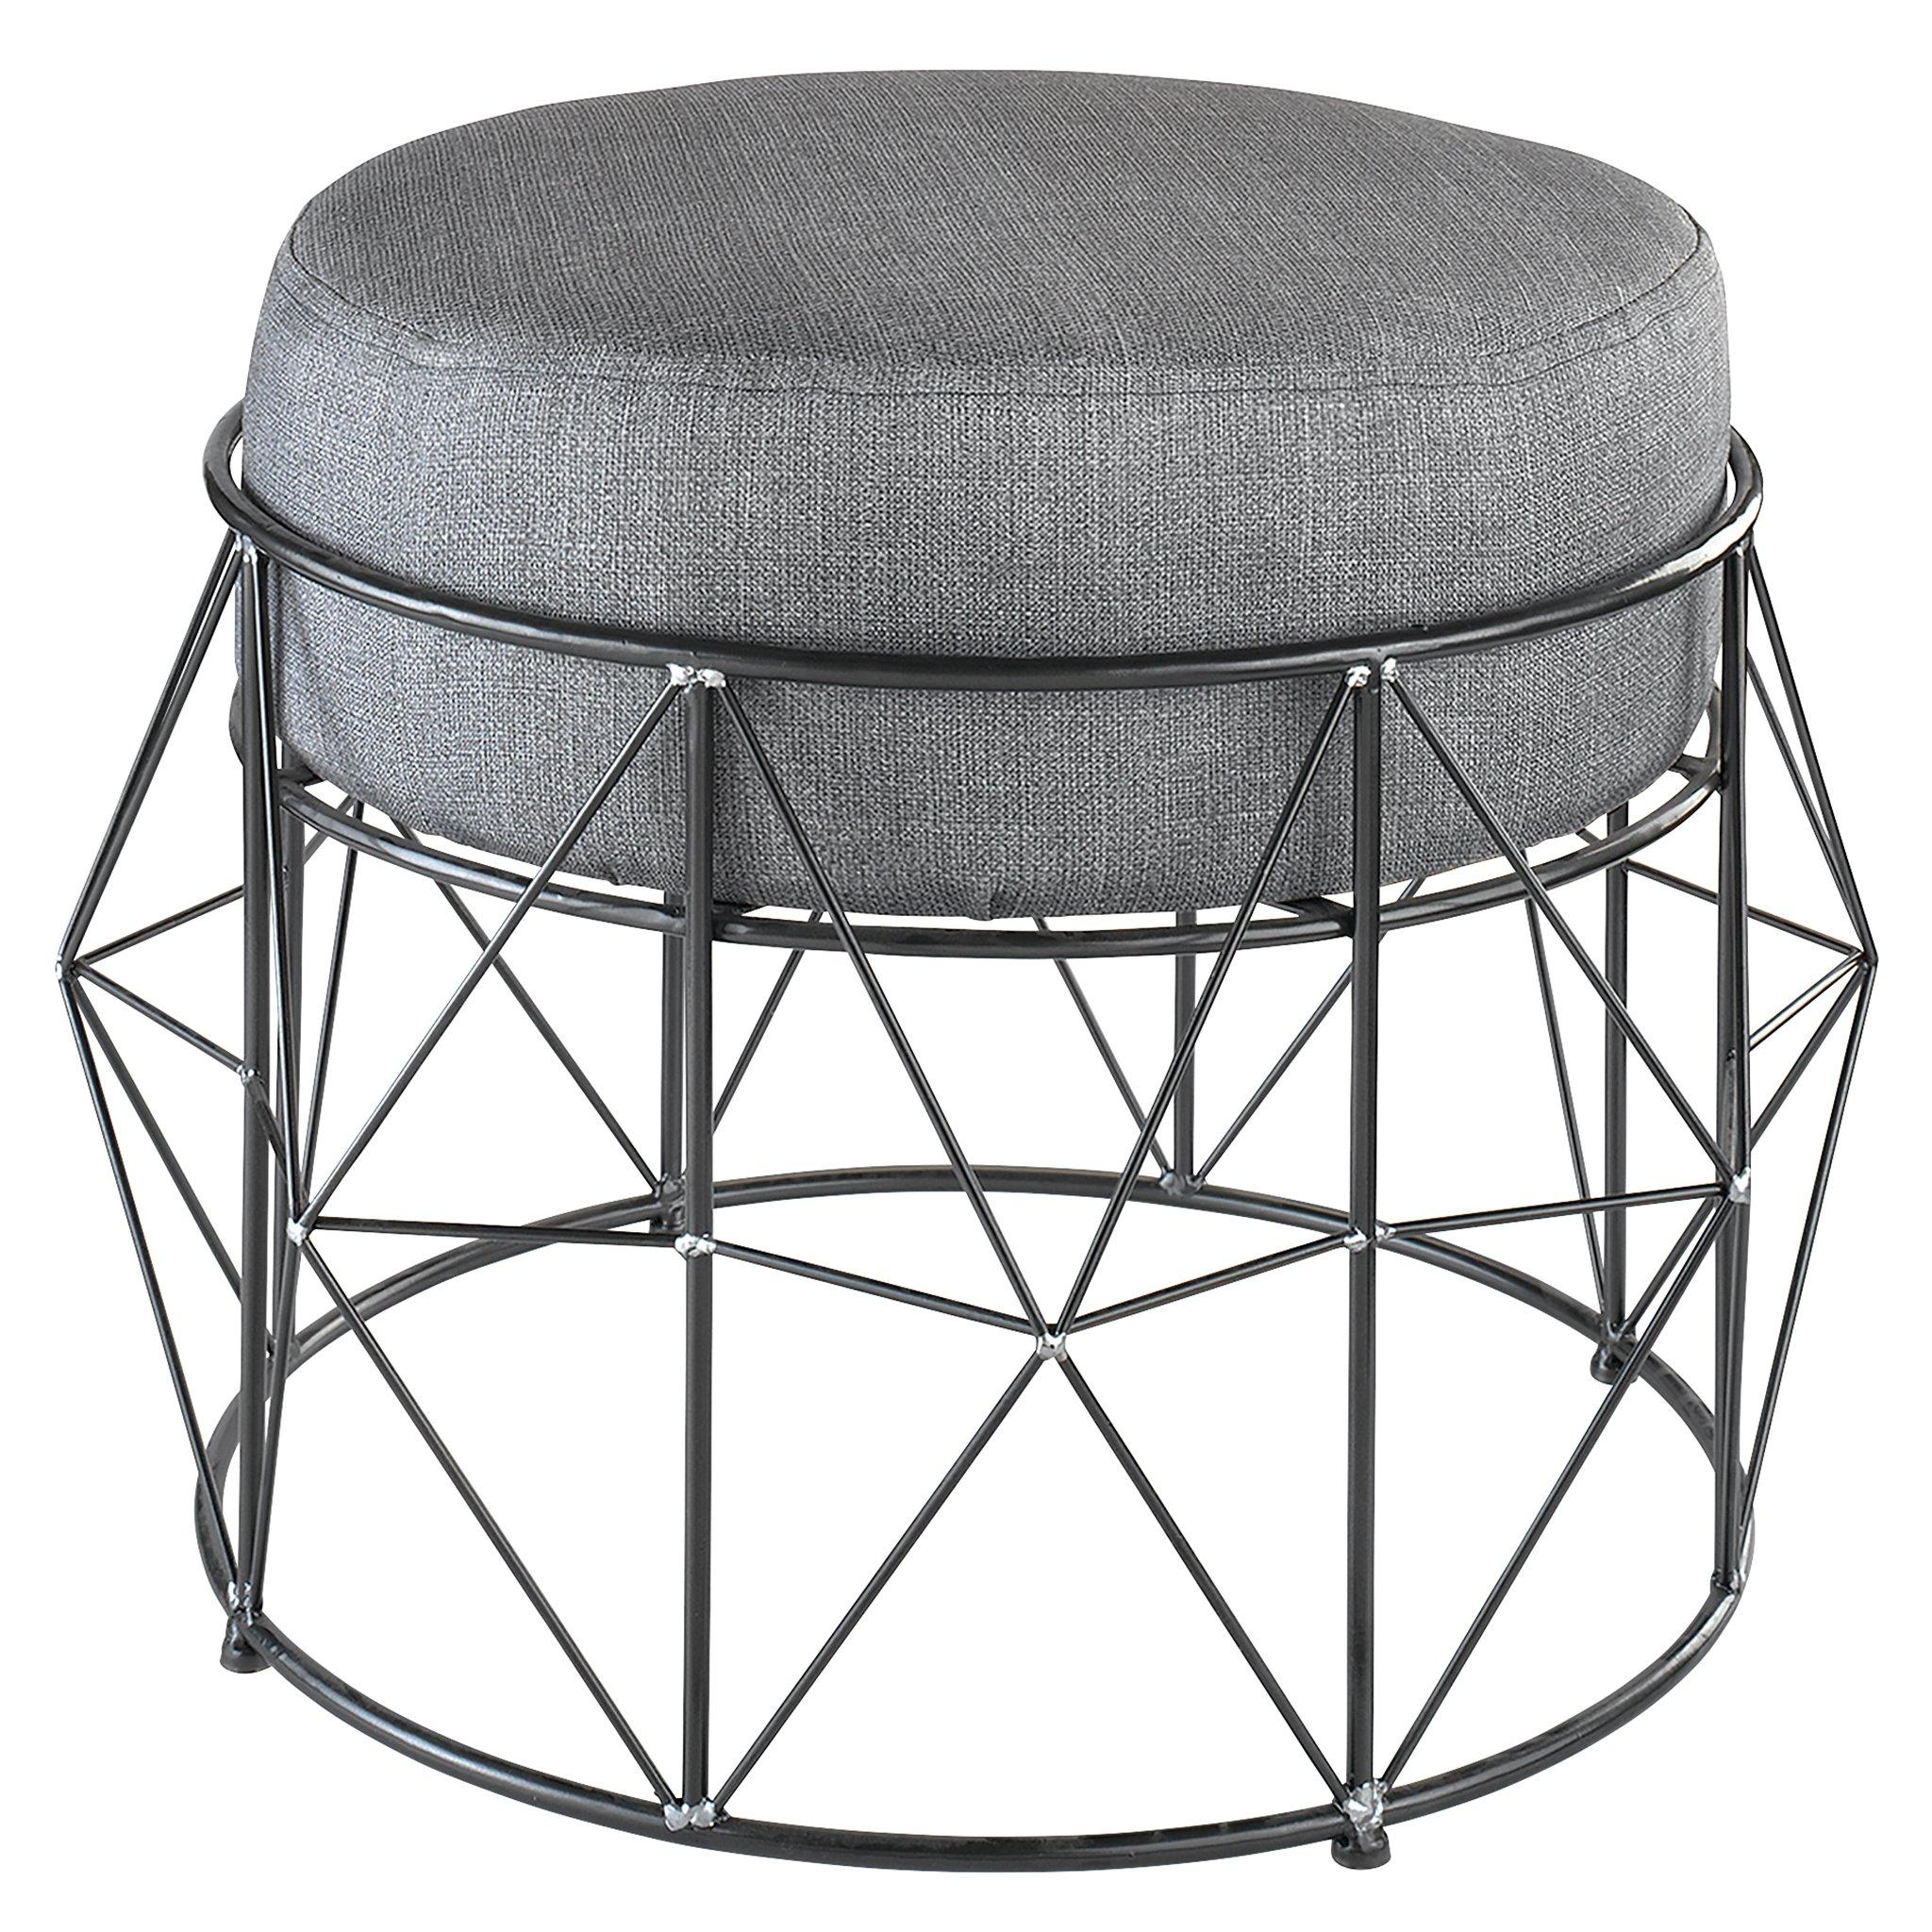 Design Toscano FU81805 Eero Geometric Vanity Chair